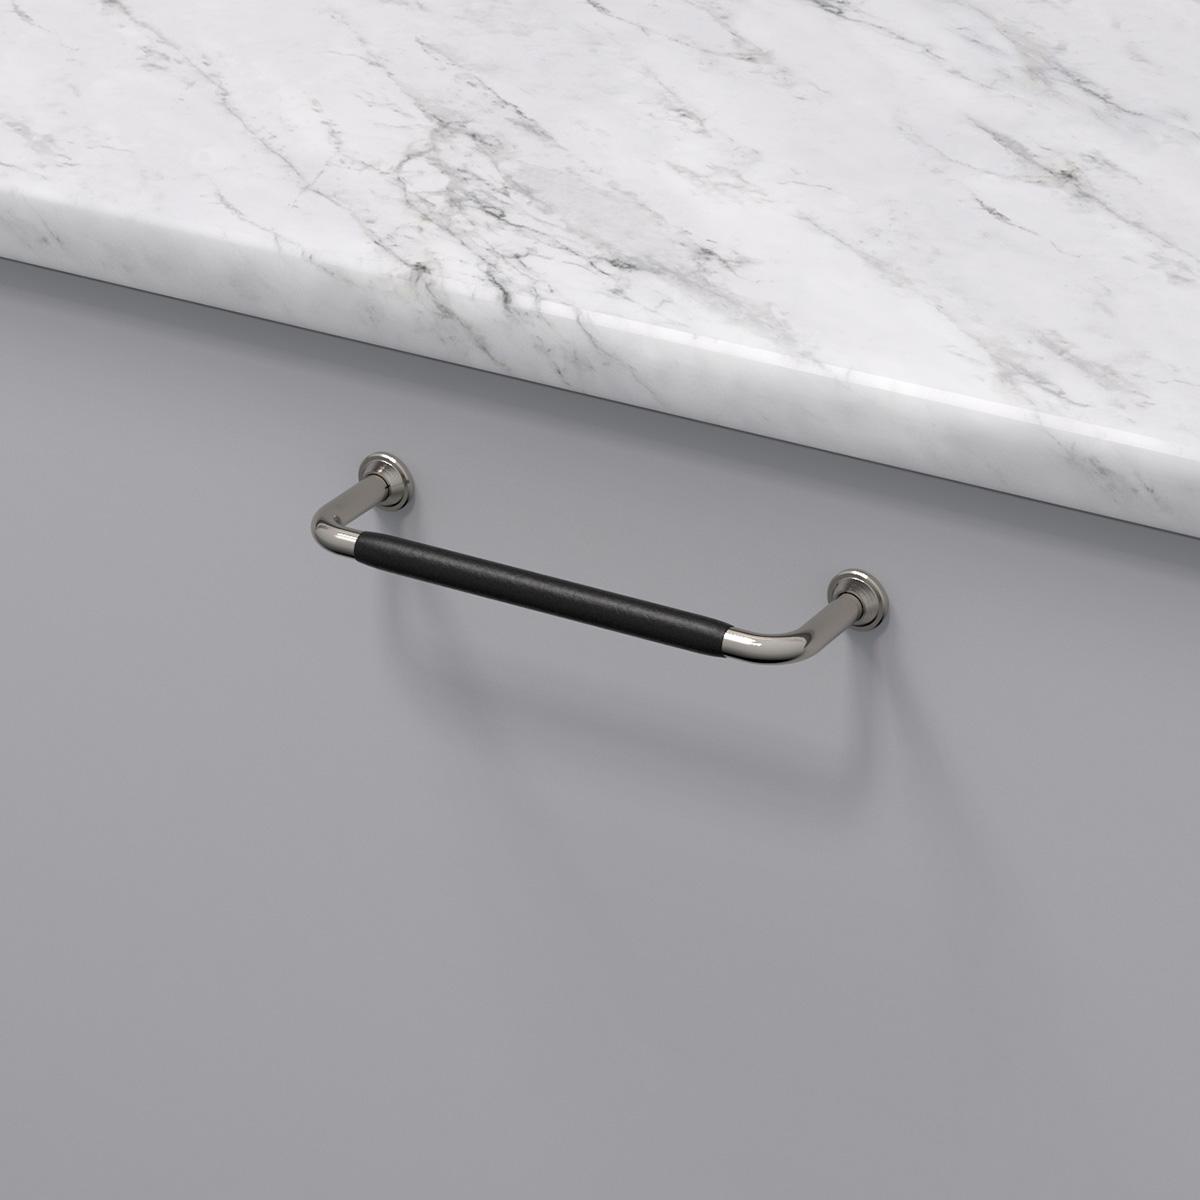 Handtag 1353 ladersvept fornicklad svart 330742 11 cc 128 mm ncs s 3000 n marmor carrara